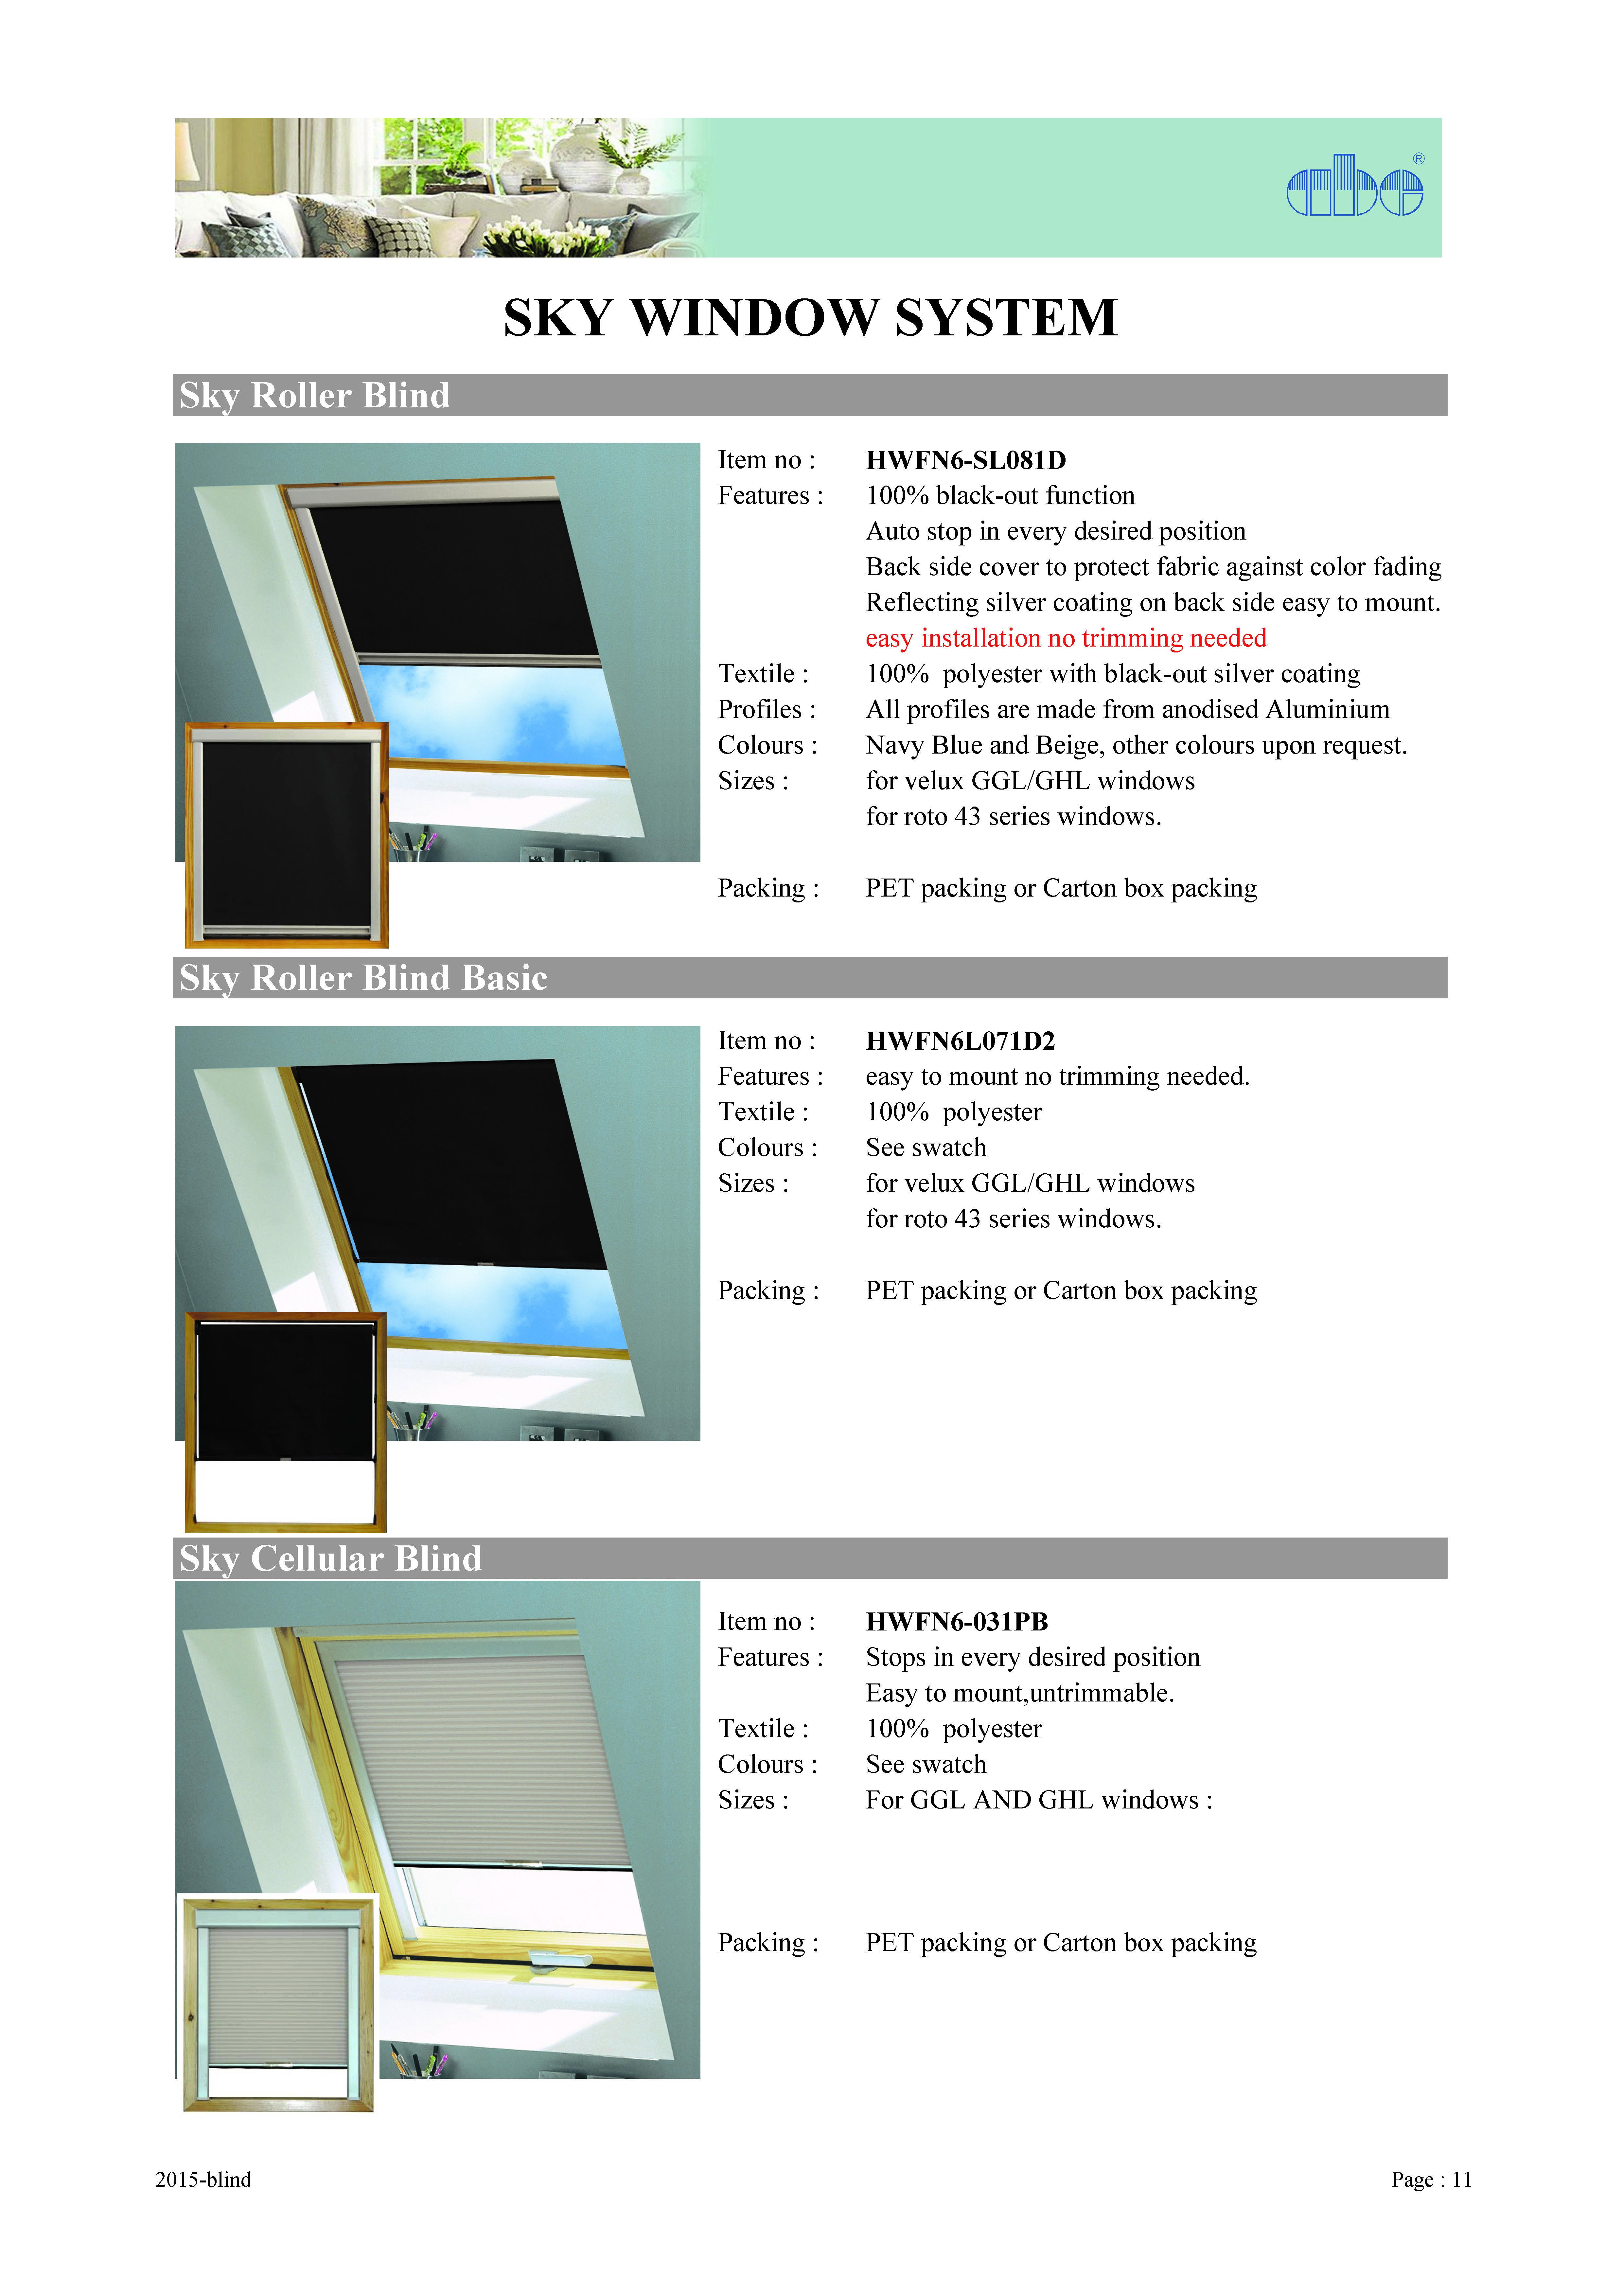 Taiwan Sky Roller Blind All Blinds Co Ltd